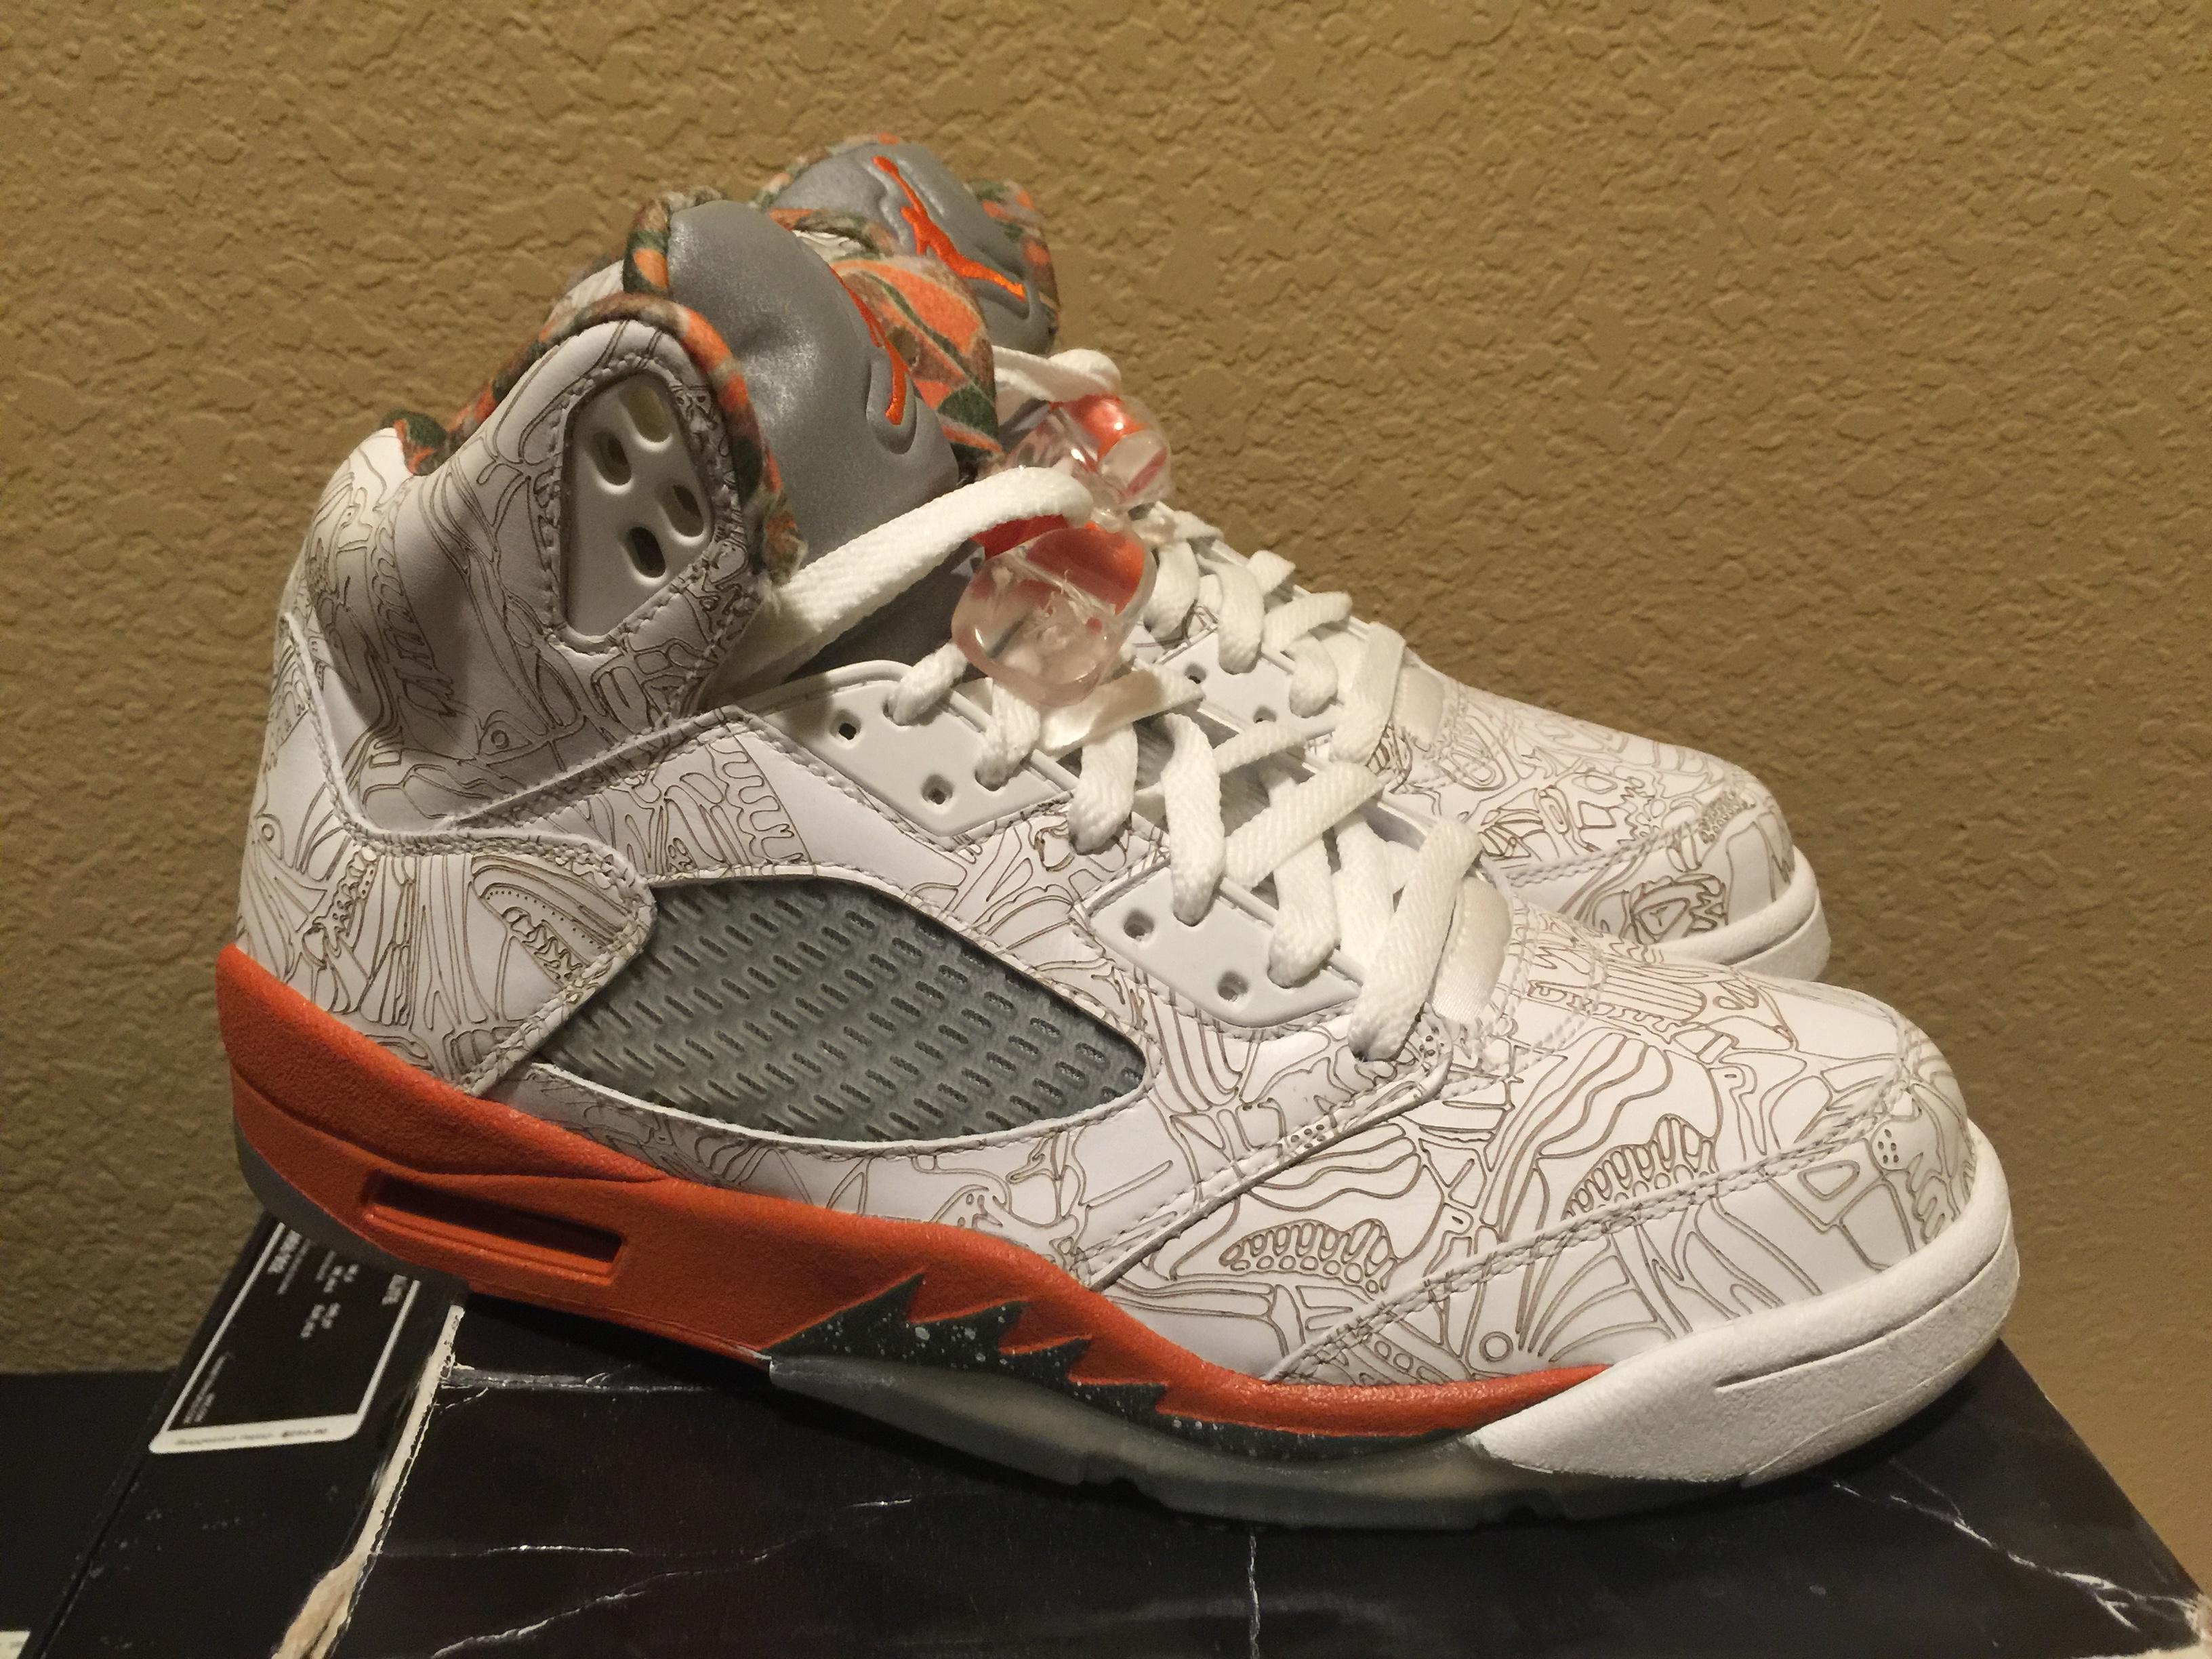 ac7b2461ce2 Jordan Brand Air Jordan Retro 5 Laser | Grailed